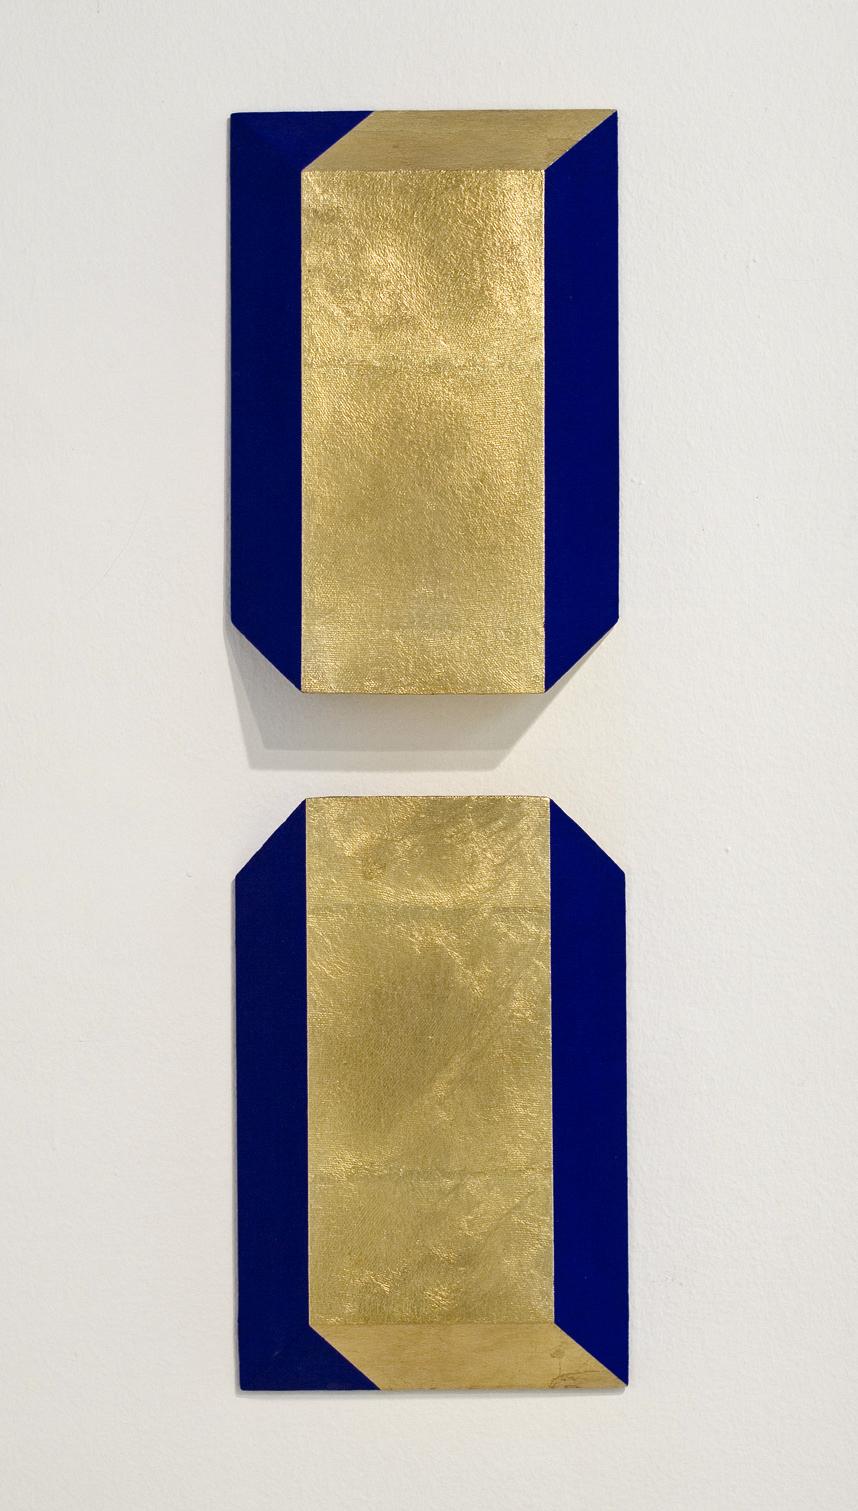 medenina, les, dvakrat 40 x 25 cm, 2000